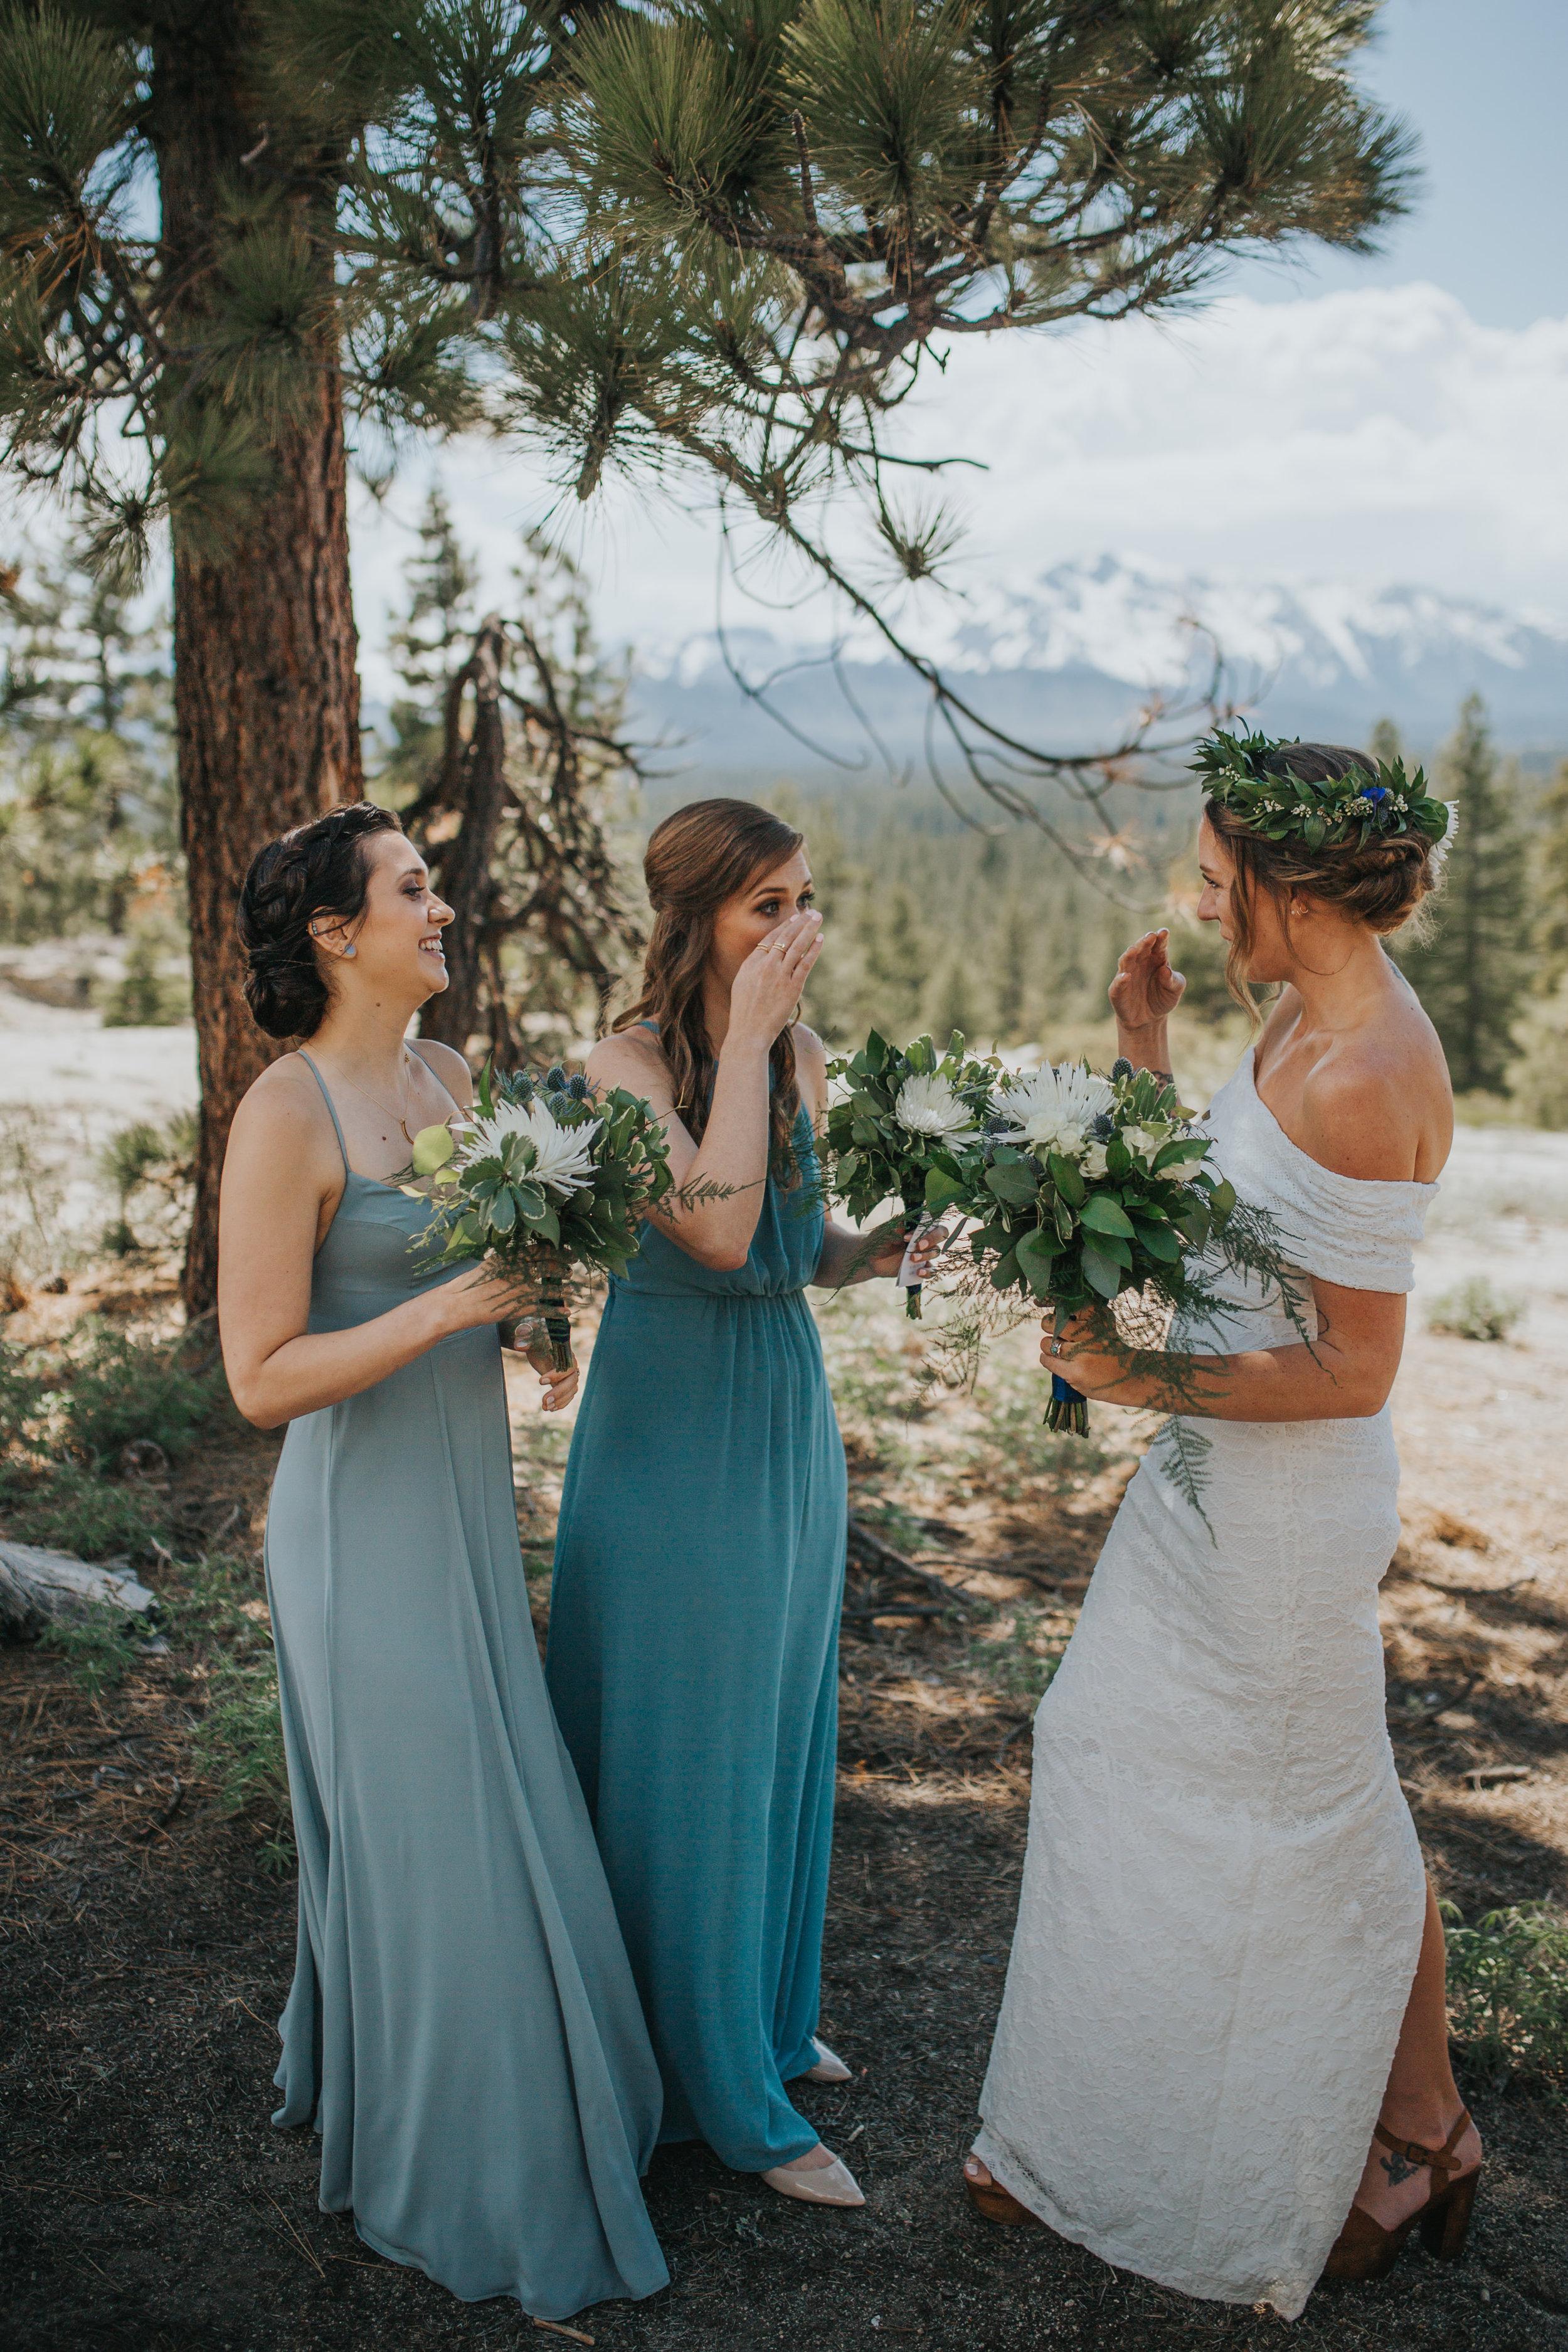 south-lake-tahoe-elopement-valerie-lendvay-photo-034.jpg